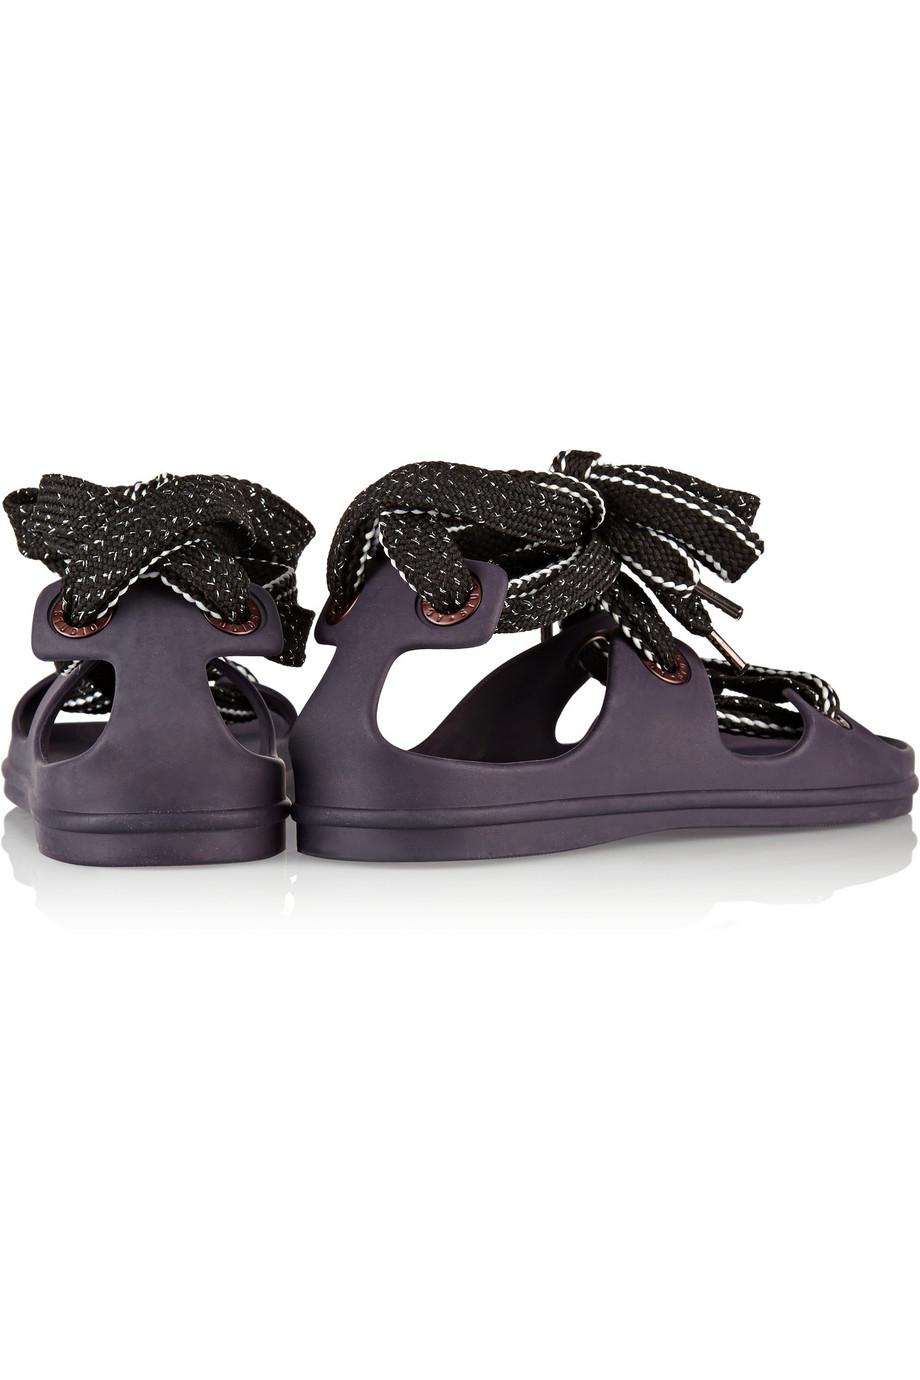 5d5359b7fca7 Lyst - Acne Studios Milo Lace-Up Rubber Sandals in Purple